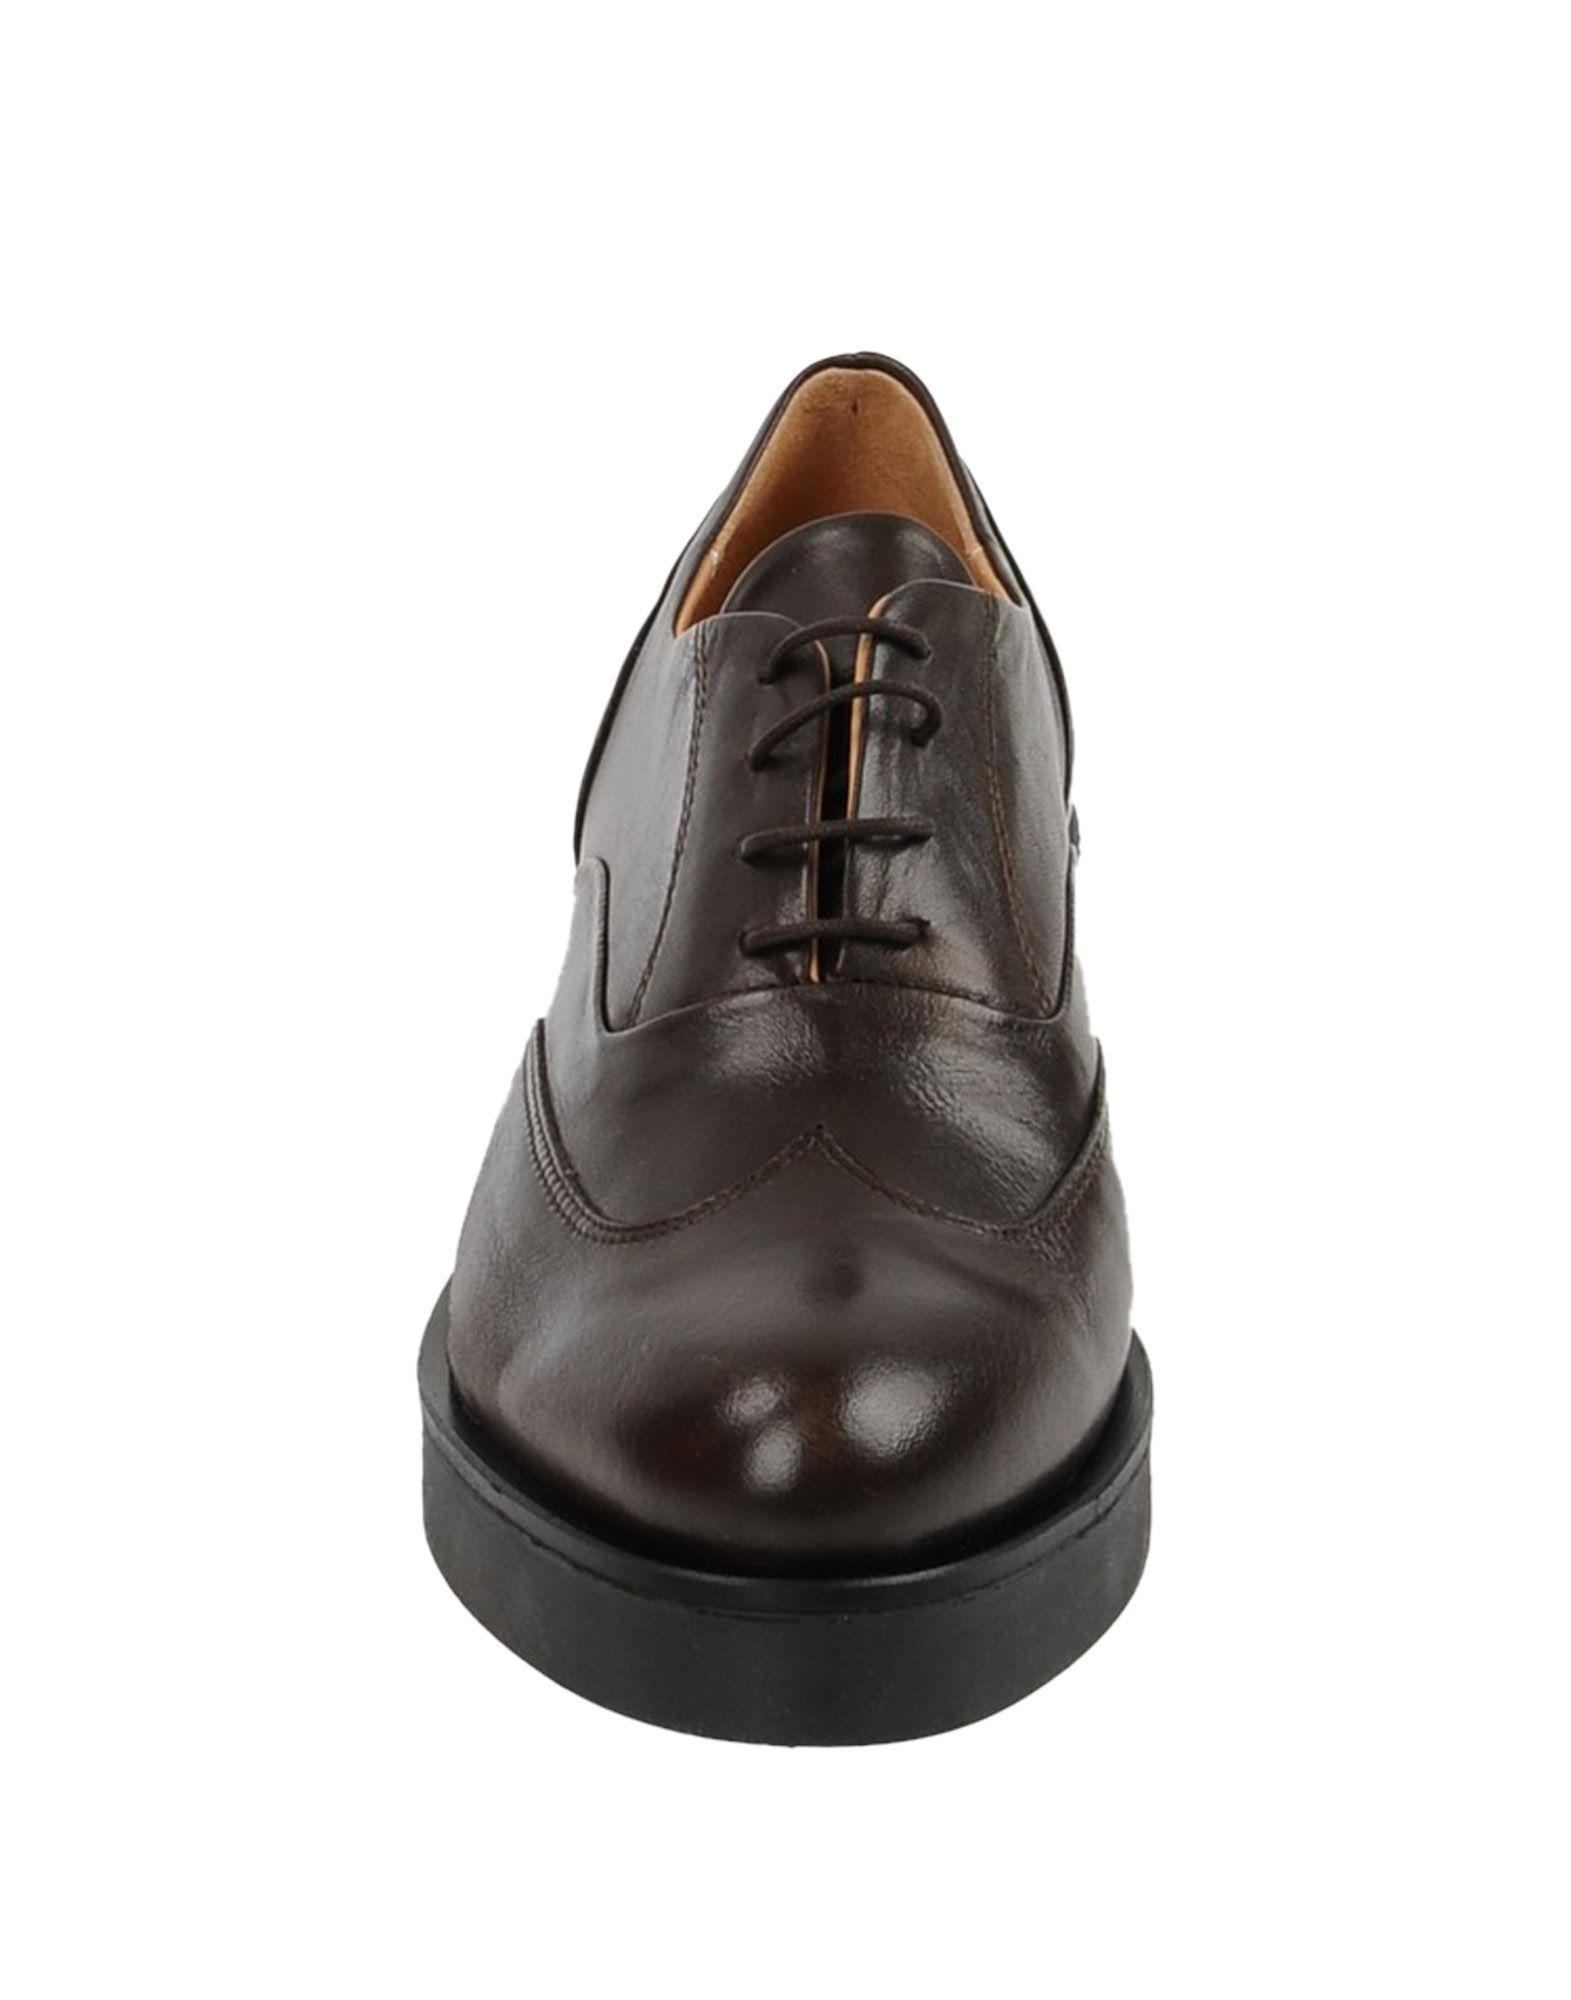 Leonardo Principi Schnürschuhe Damen  11340050MP Gute Qualität beliebte Schuhe Schuhe beliebte c0b471